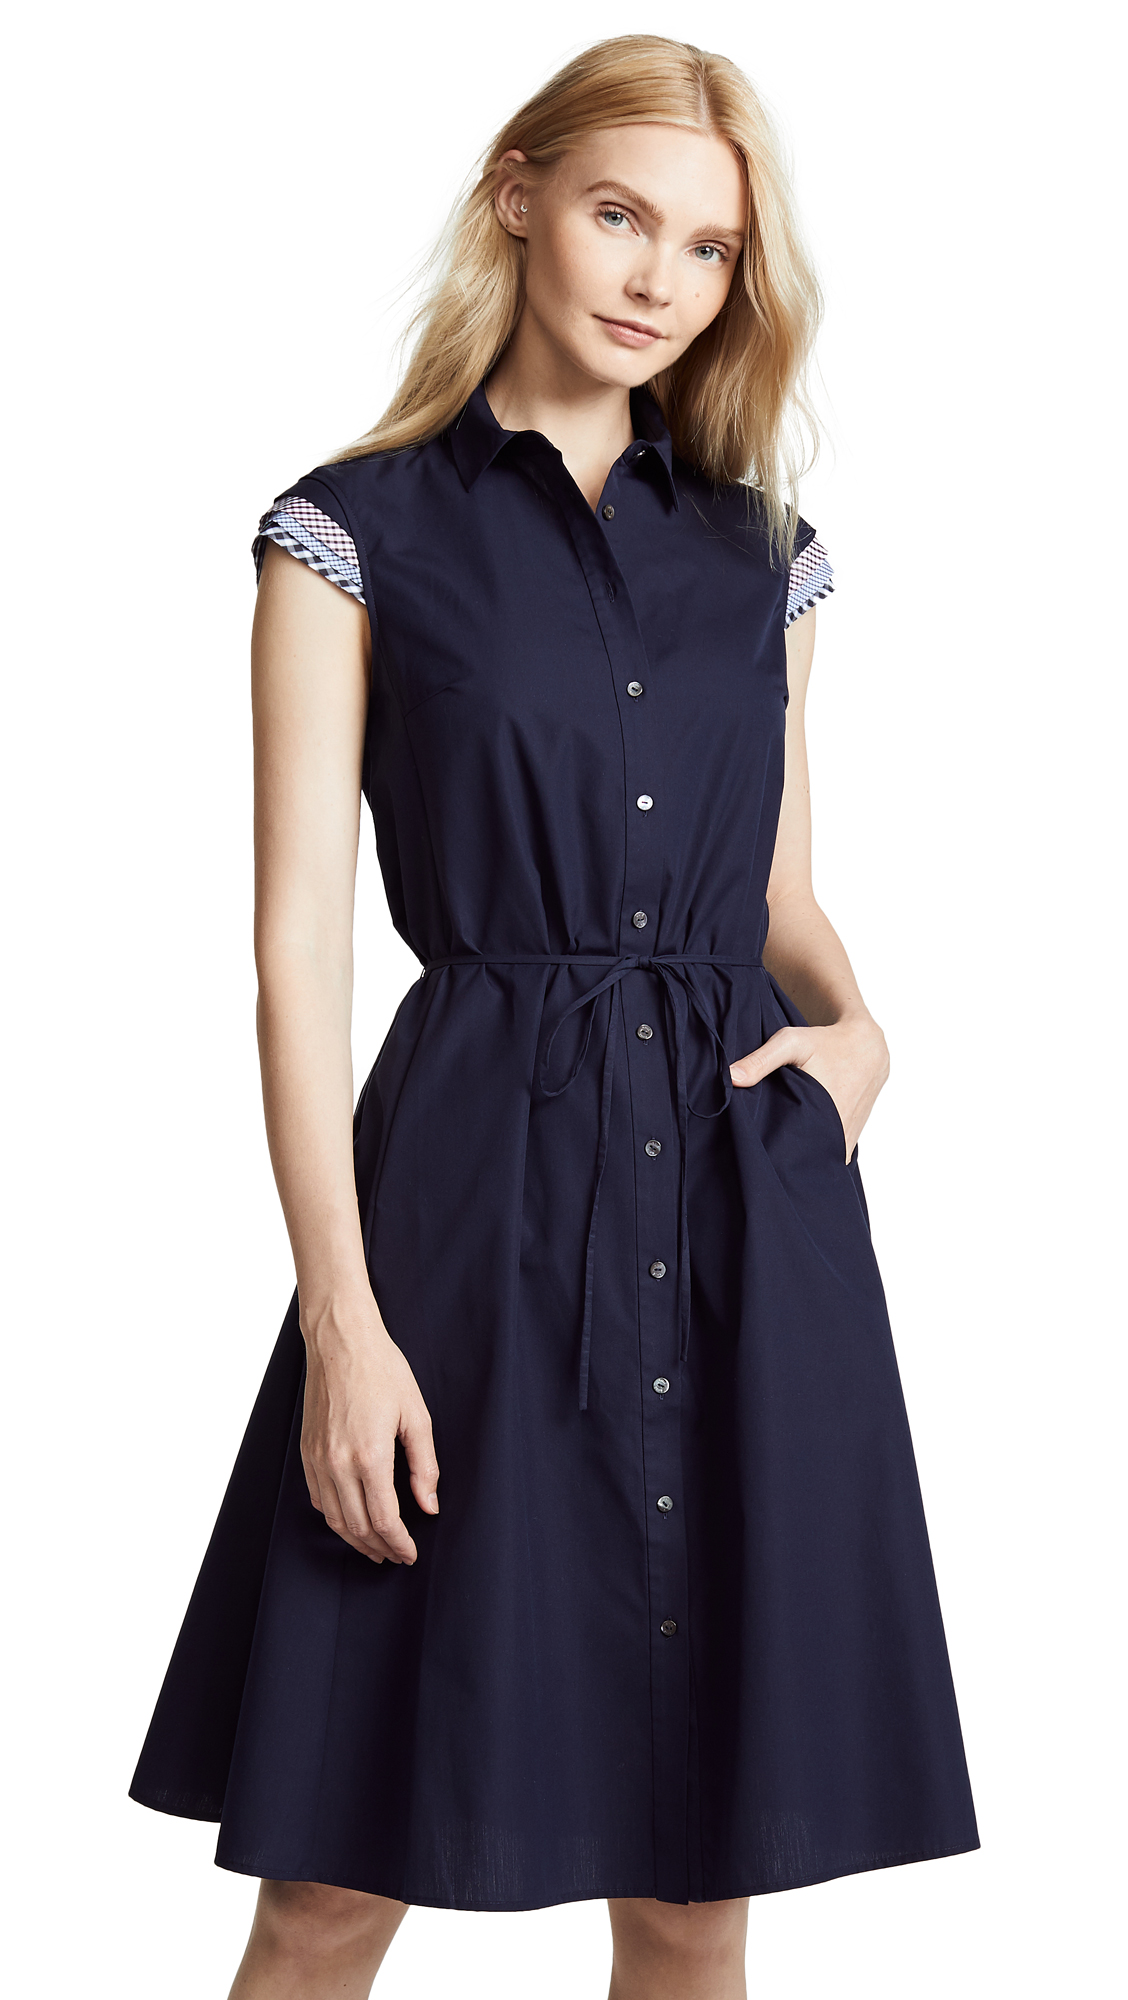 RHIÉ Cap Sleeve Dress in Navy